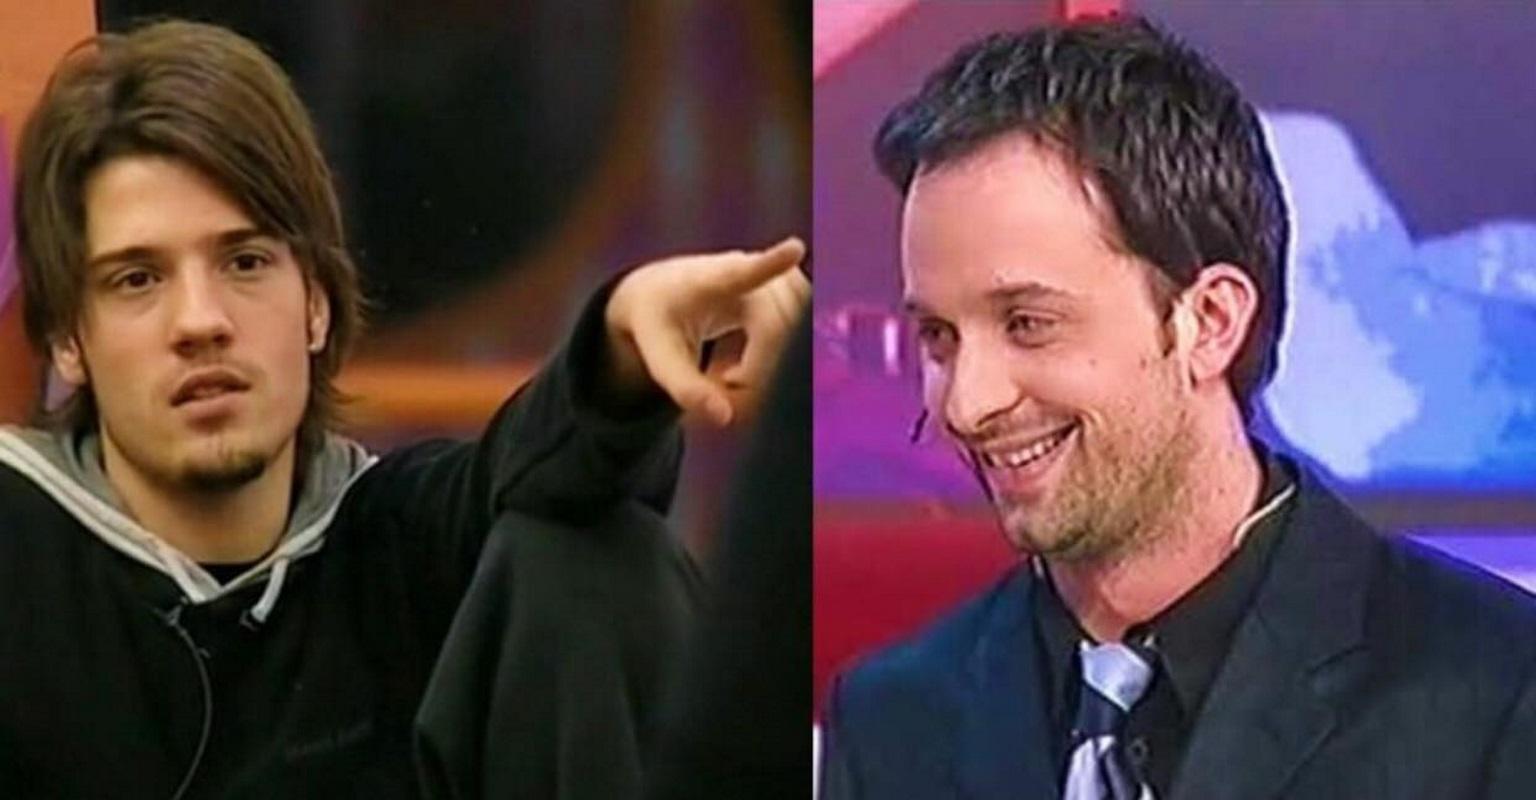 The Voice: Όταν ο Κωνσταντίνος Αργυρός και ο Γιώργος Λιανός ήταν μαζί στο Fame Story 3